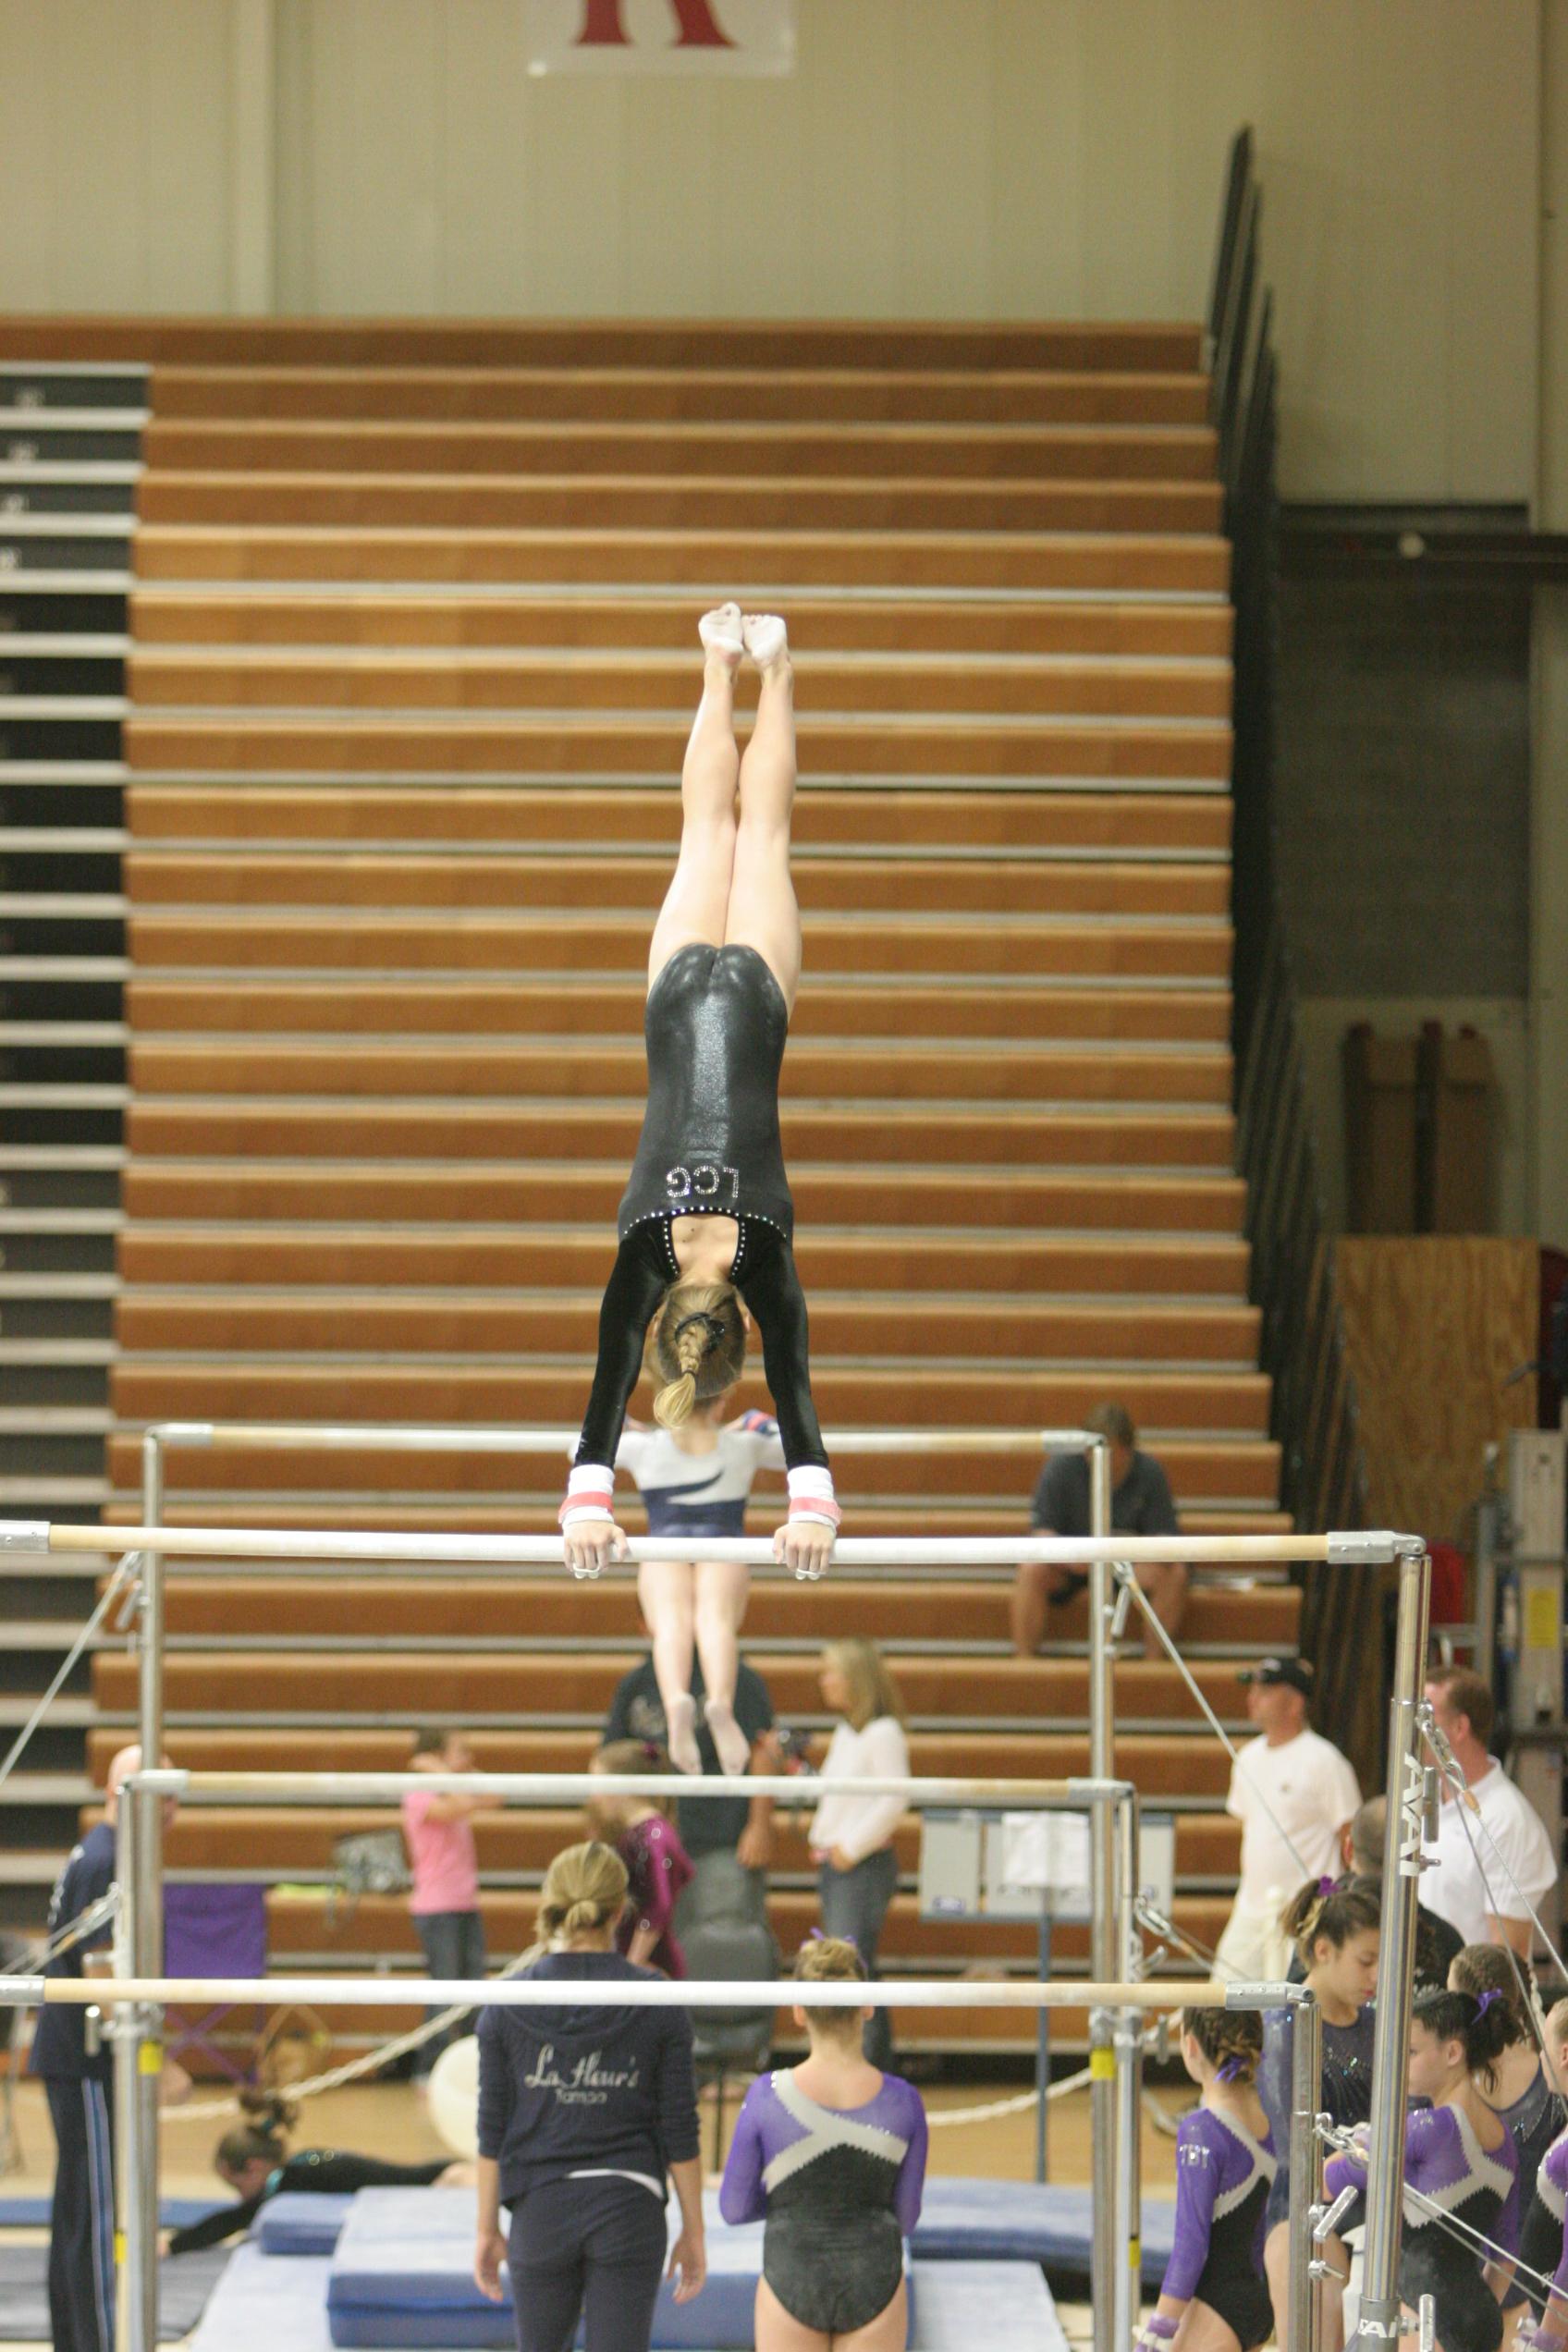 tampa bay classic gymnastics meet 2013